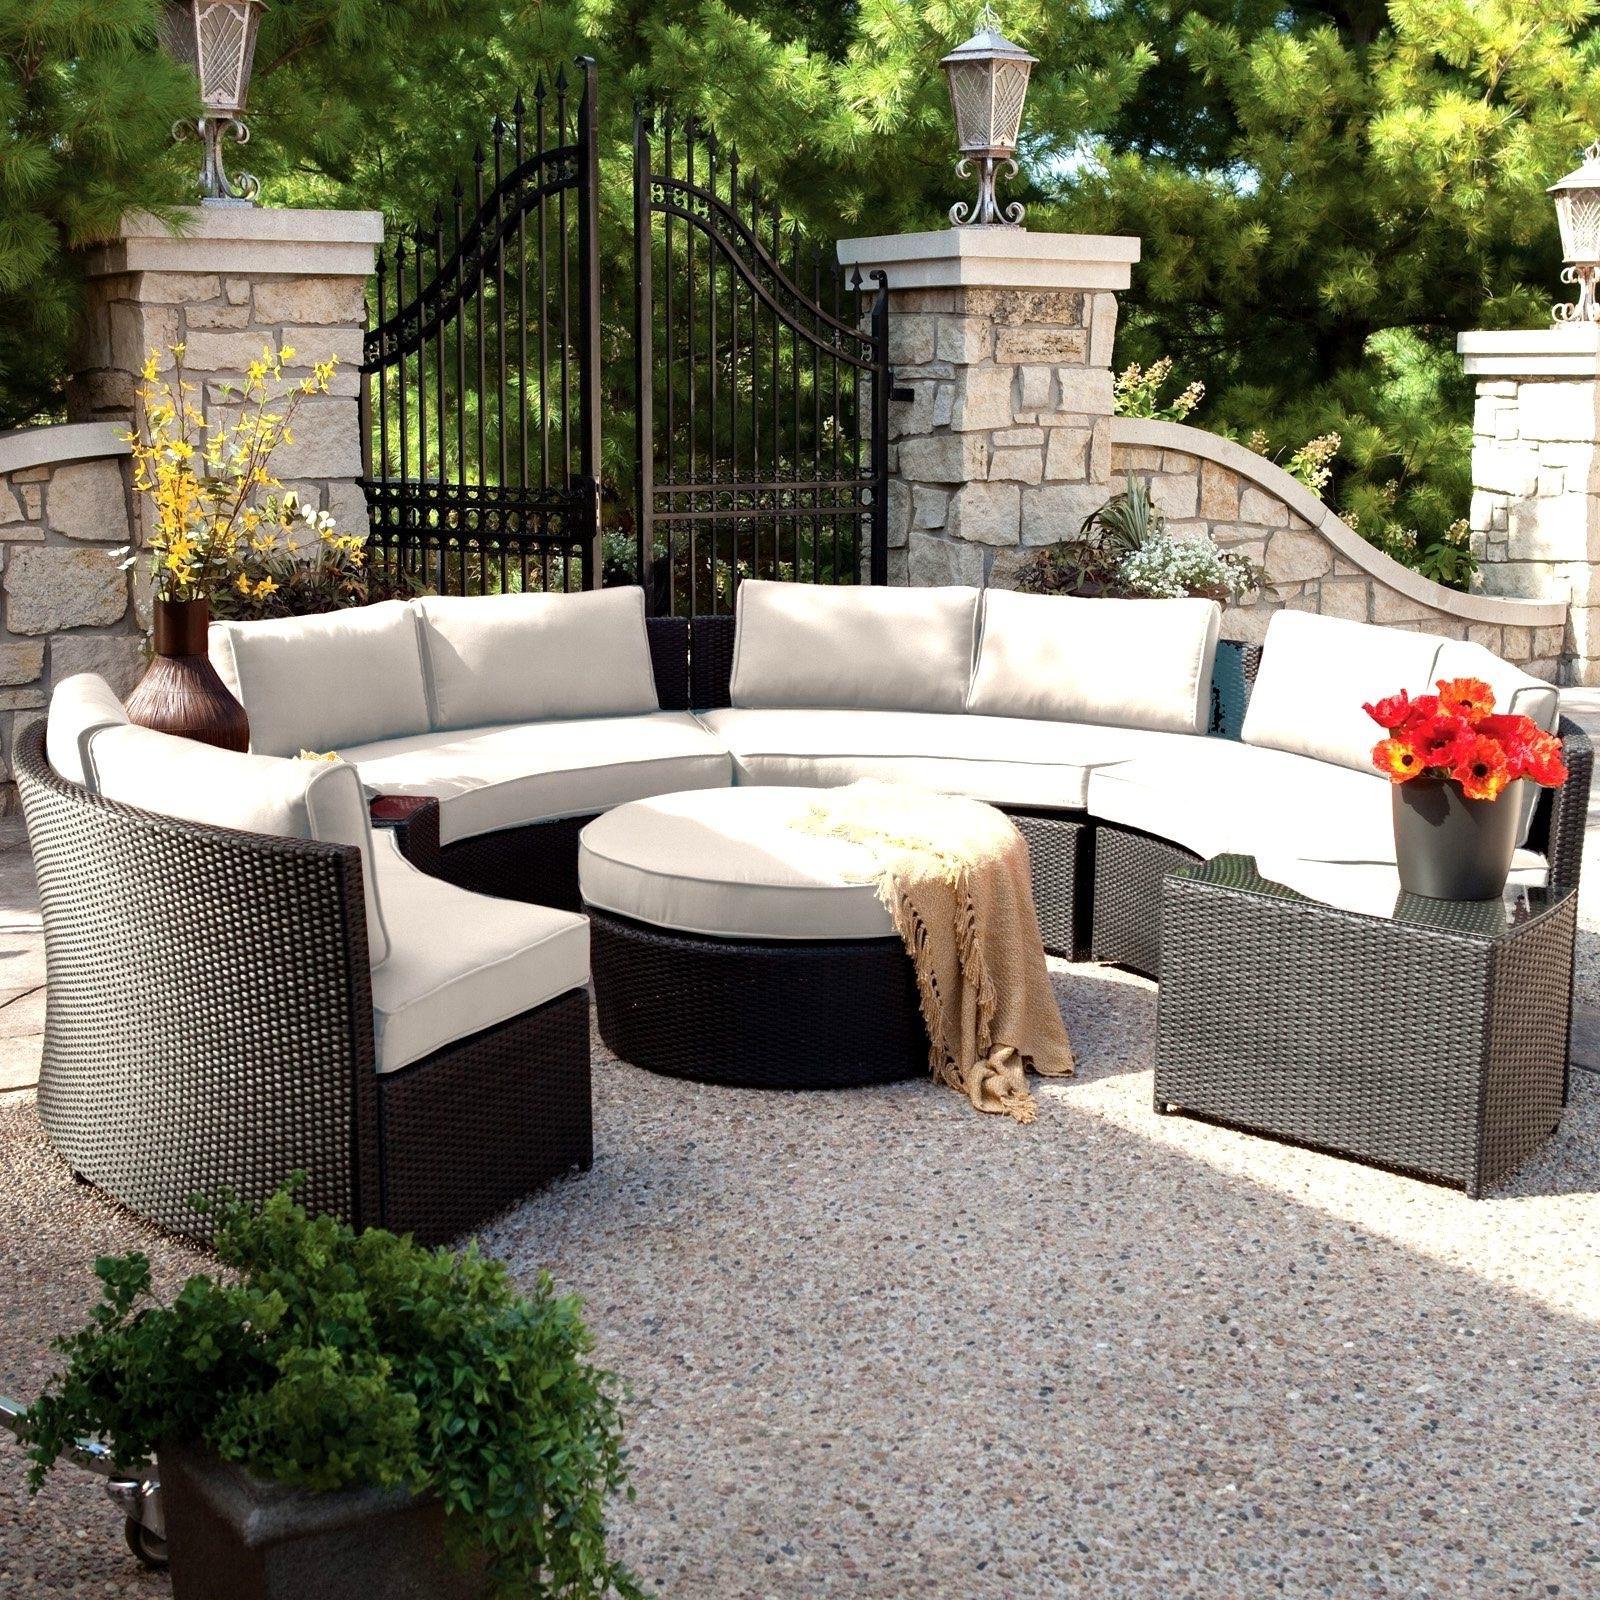 Widely Used Sunbrella Outdoor Furniture Awesome Outdoor Furniture Cushions With Sunbrella Black Patio Umbrellas (View 13 of 20)